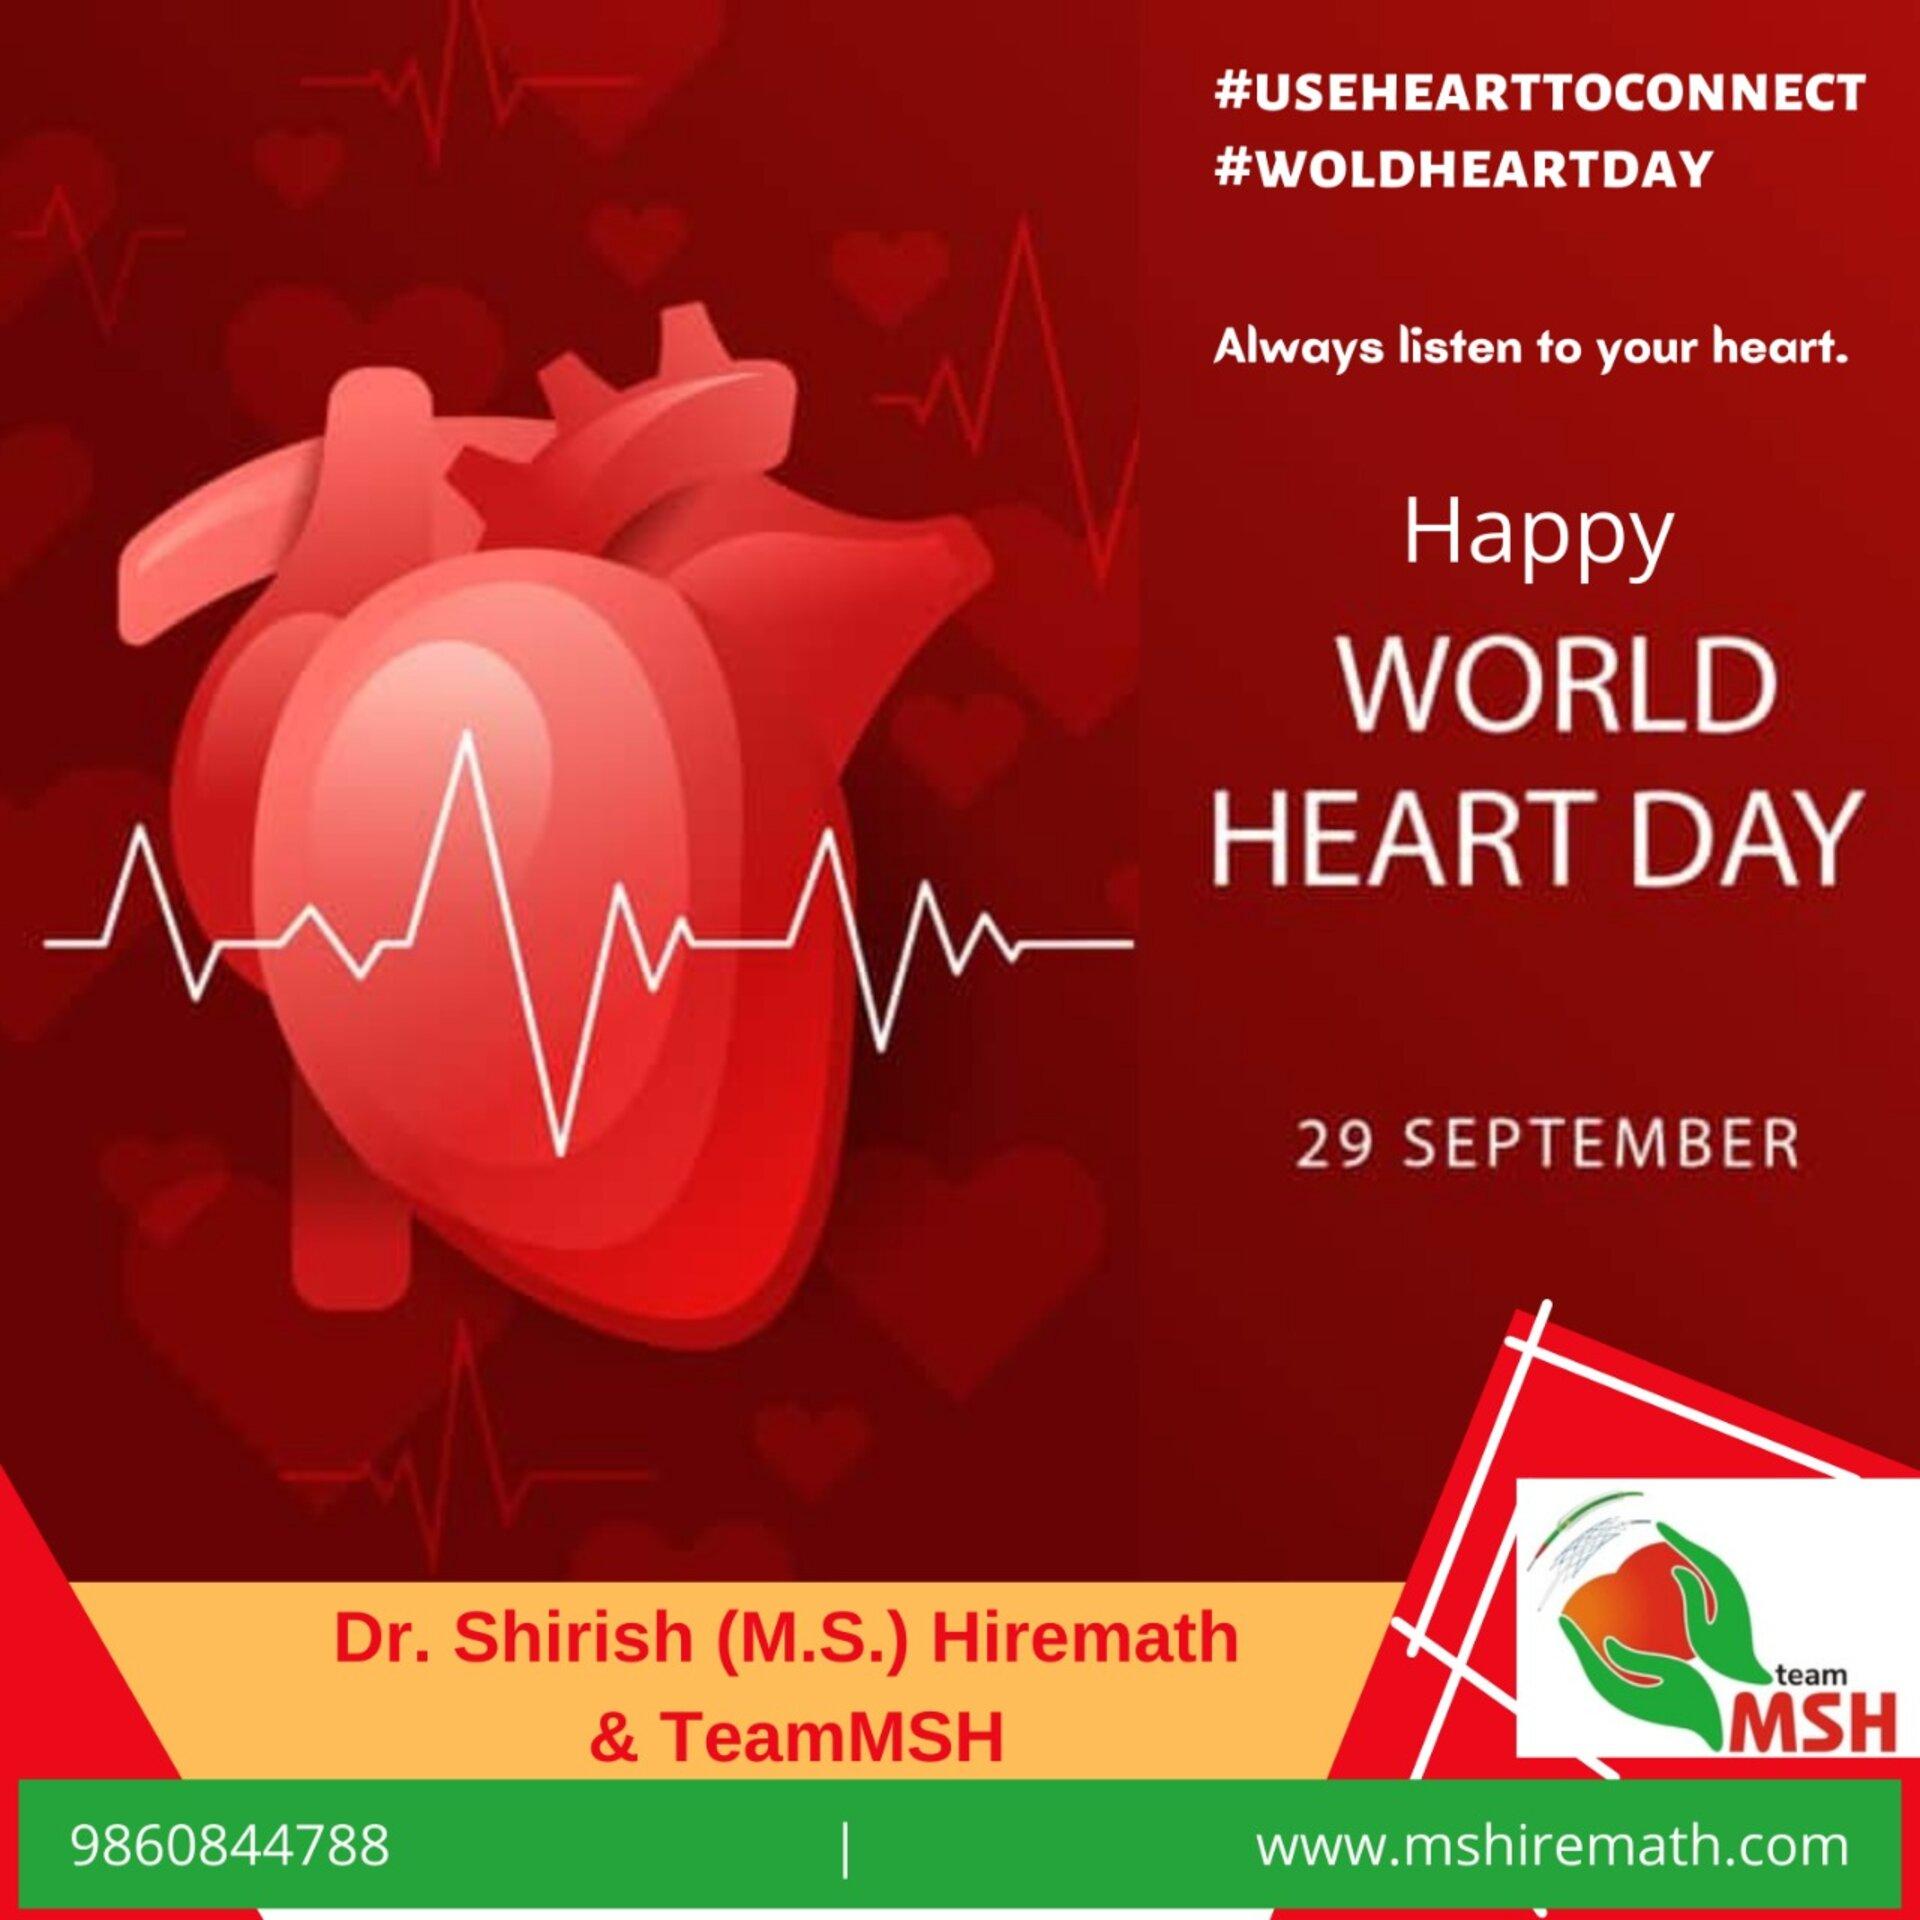 World Heart Day | 5 Tips for Health Heart by Dr. Shirish Hiremath